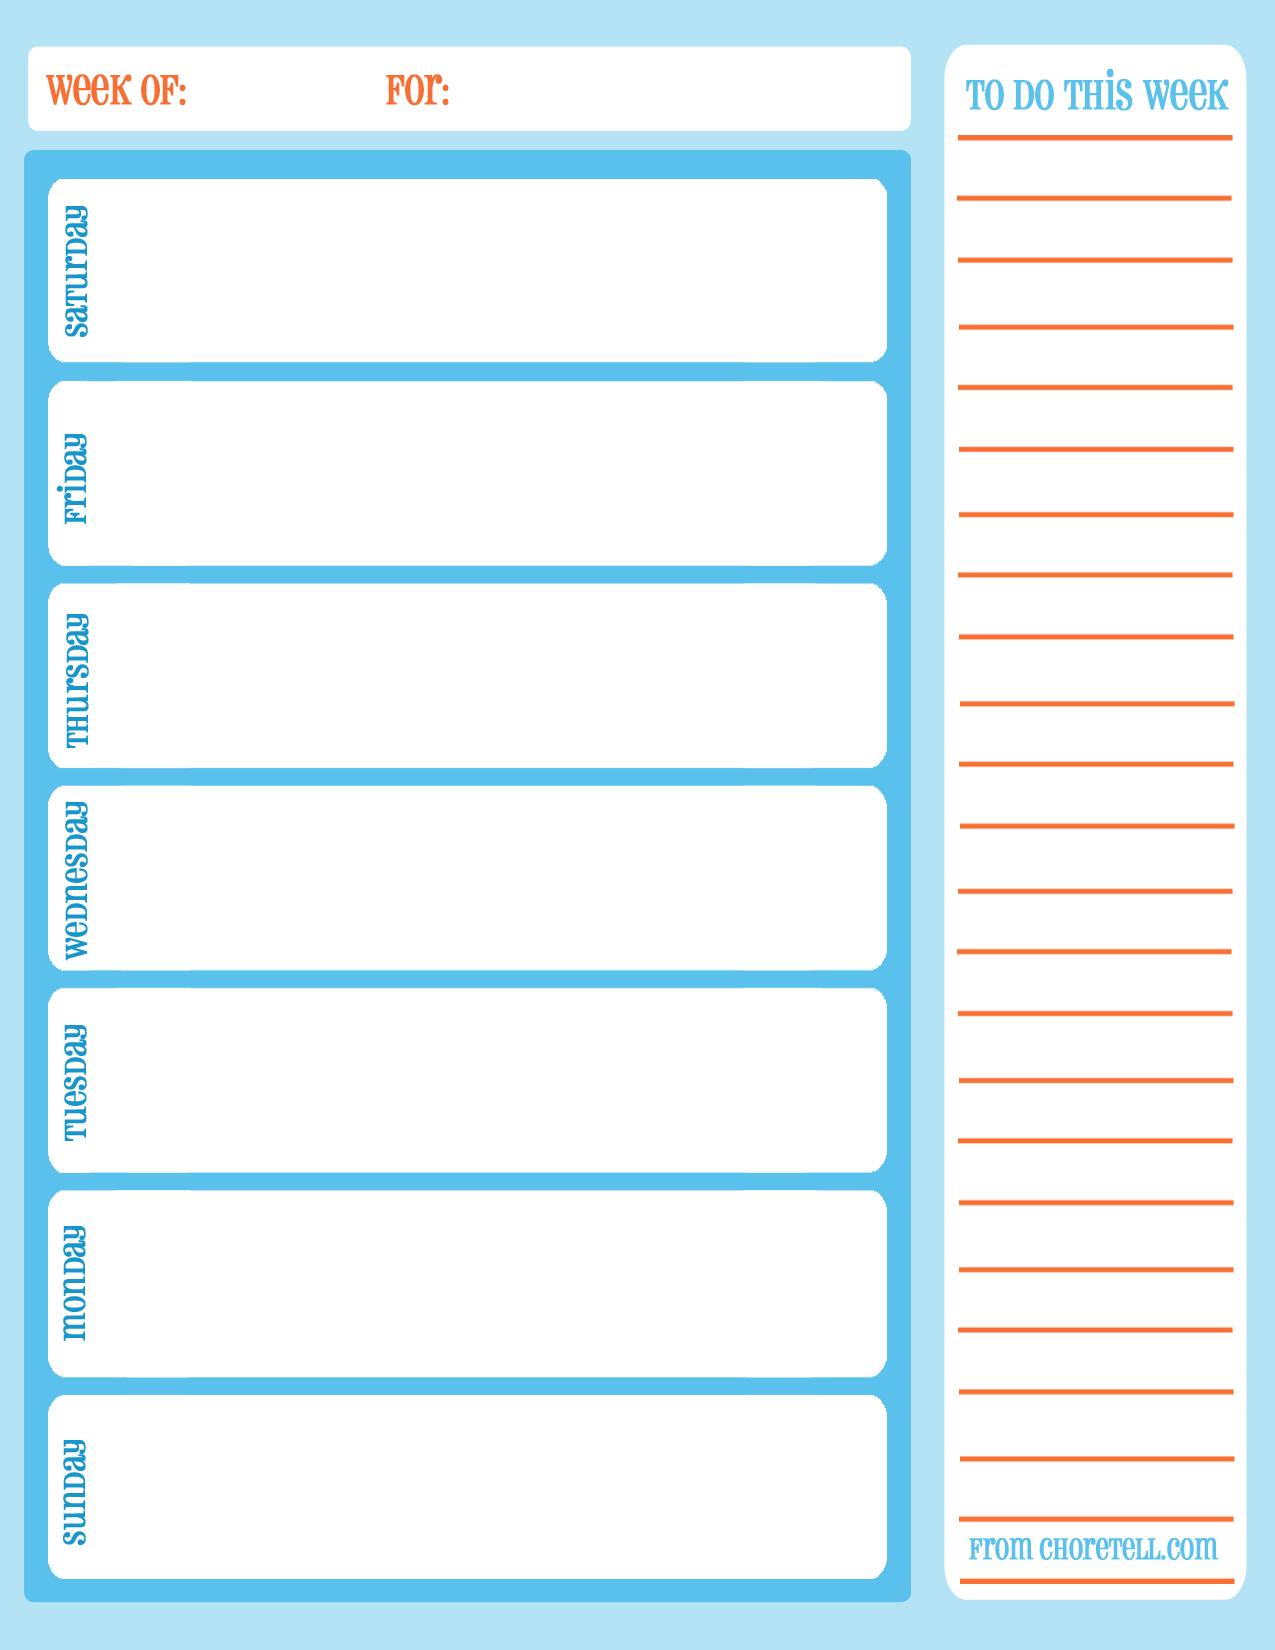 Weekly Task List Chore Calendar | Chore Calendar, Free